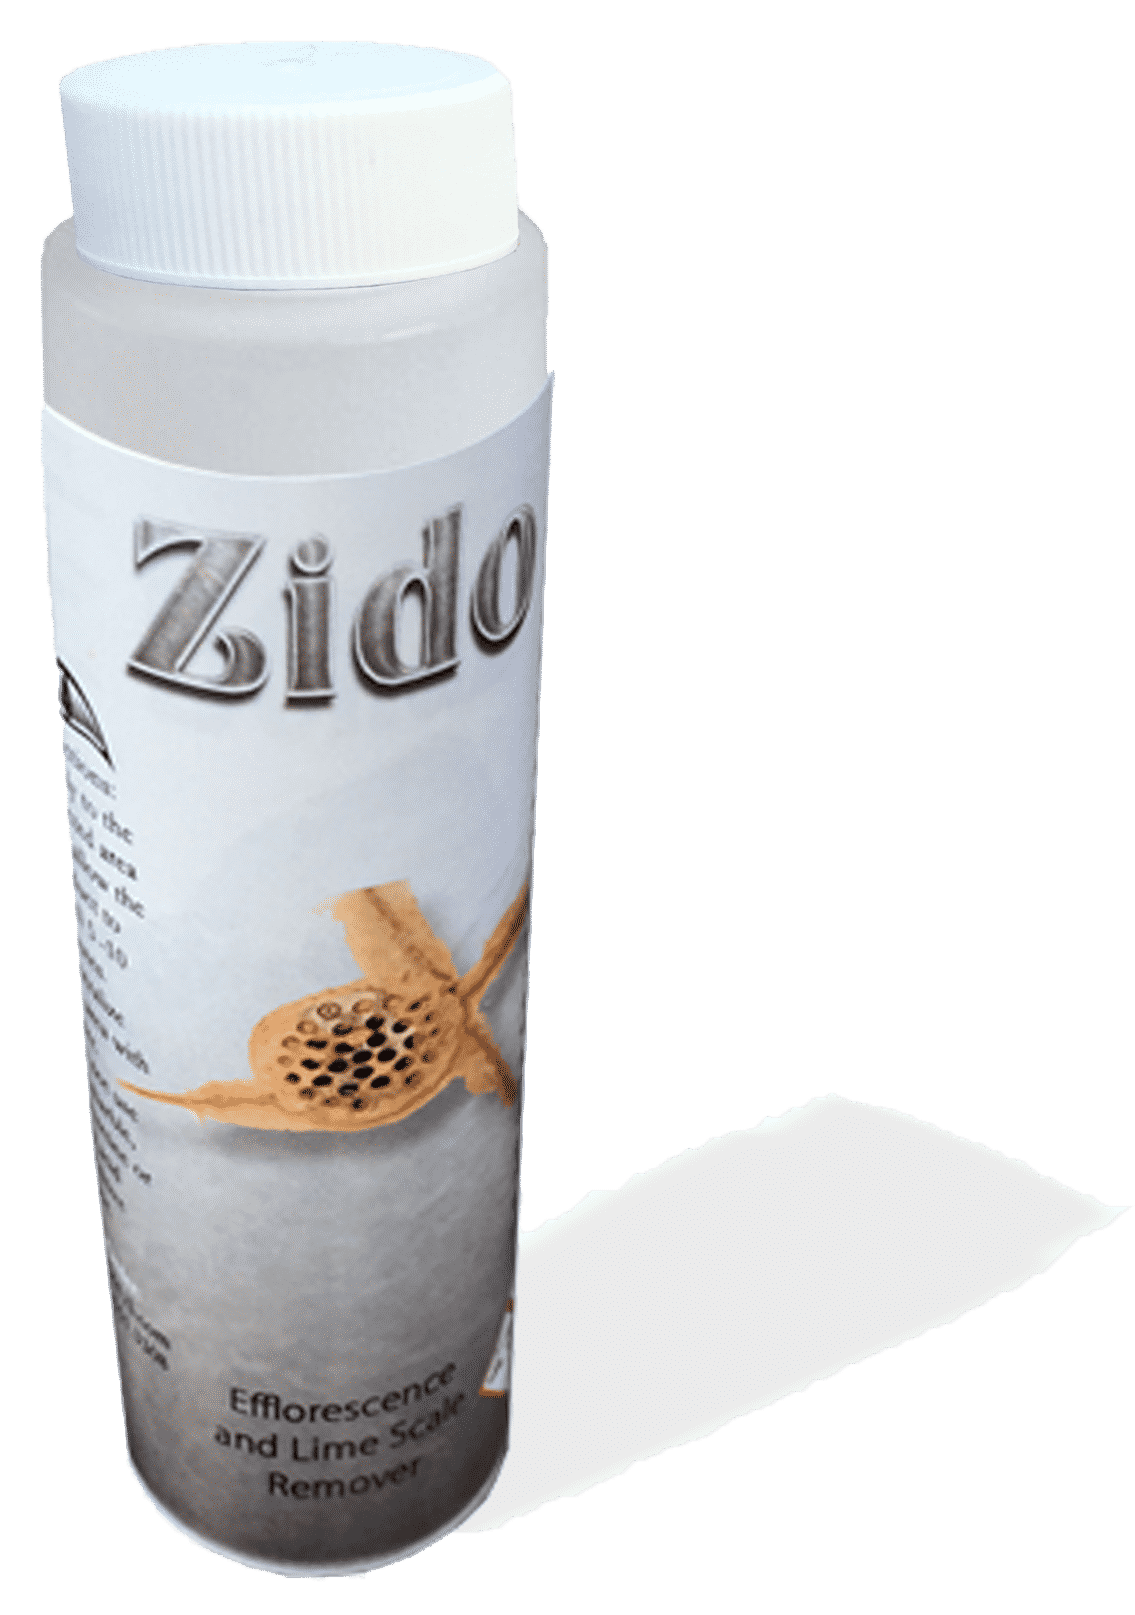 Zido-bottle